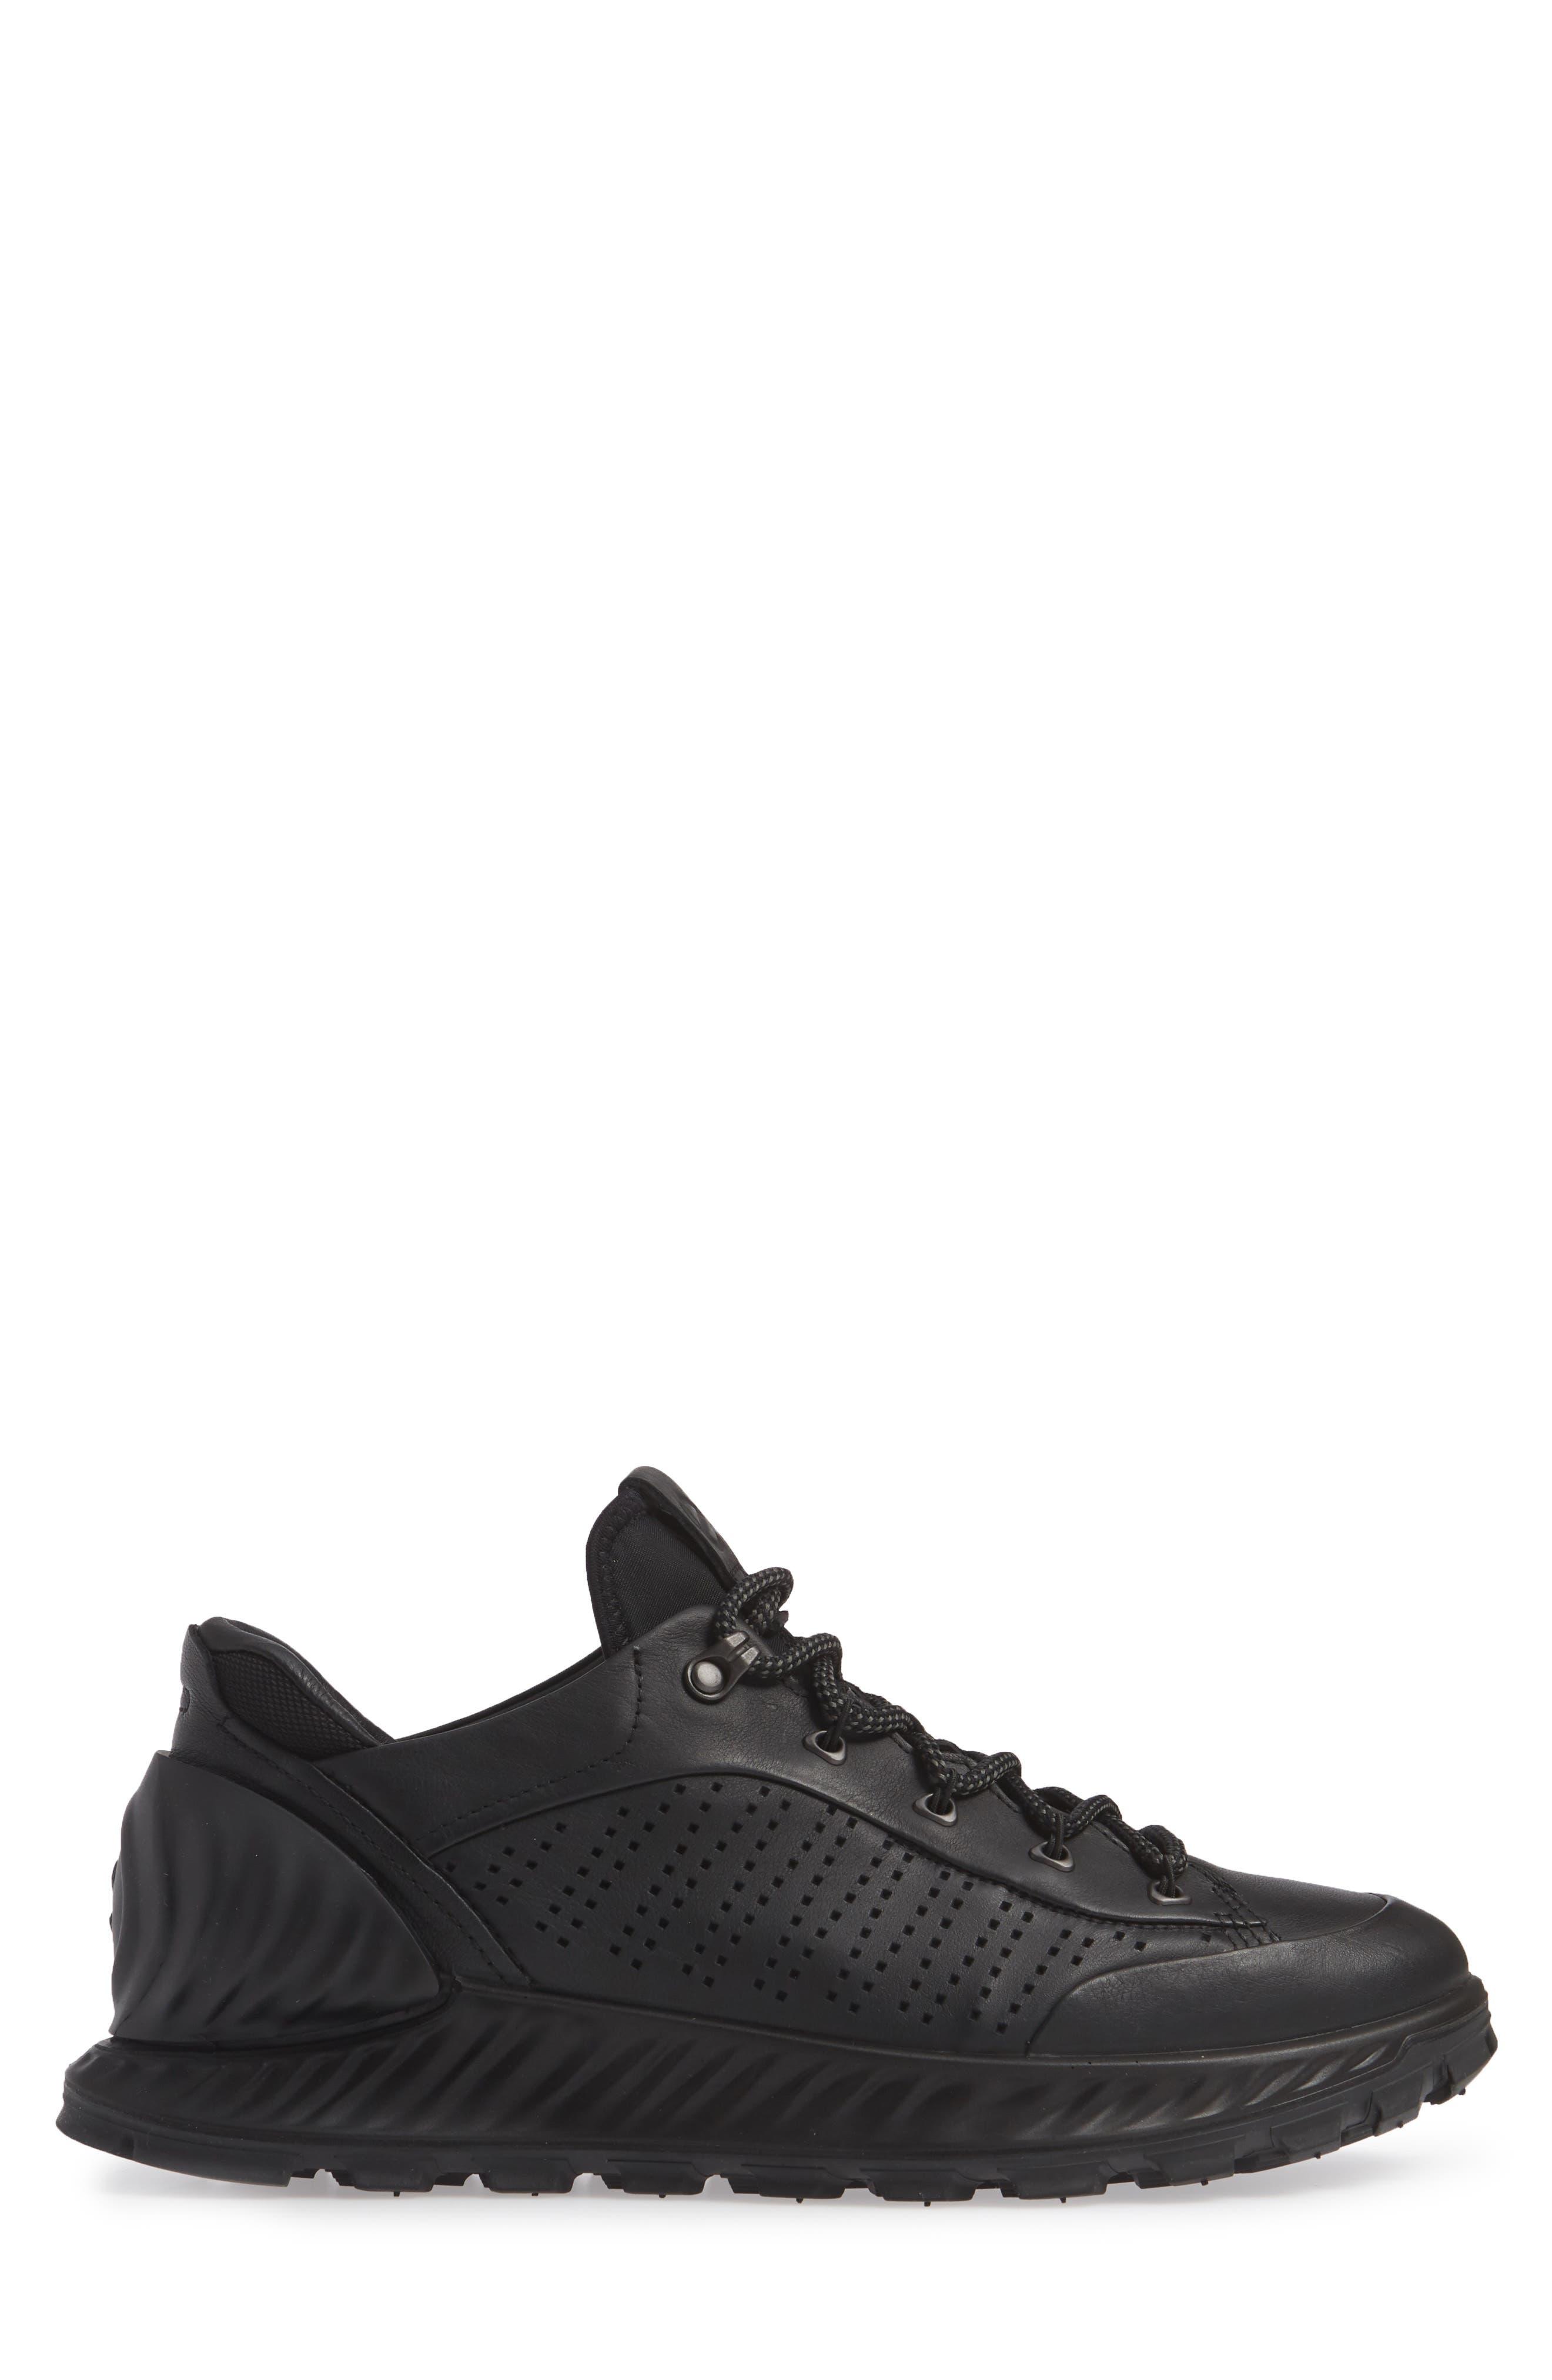 Exostrike High Top Sneaker,                             Alternate thumbnail 3, color,                             BLACK LEATHER